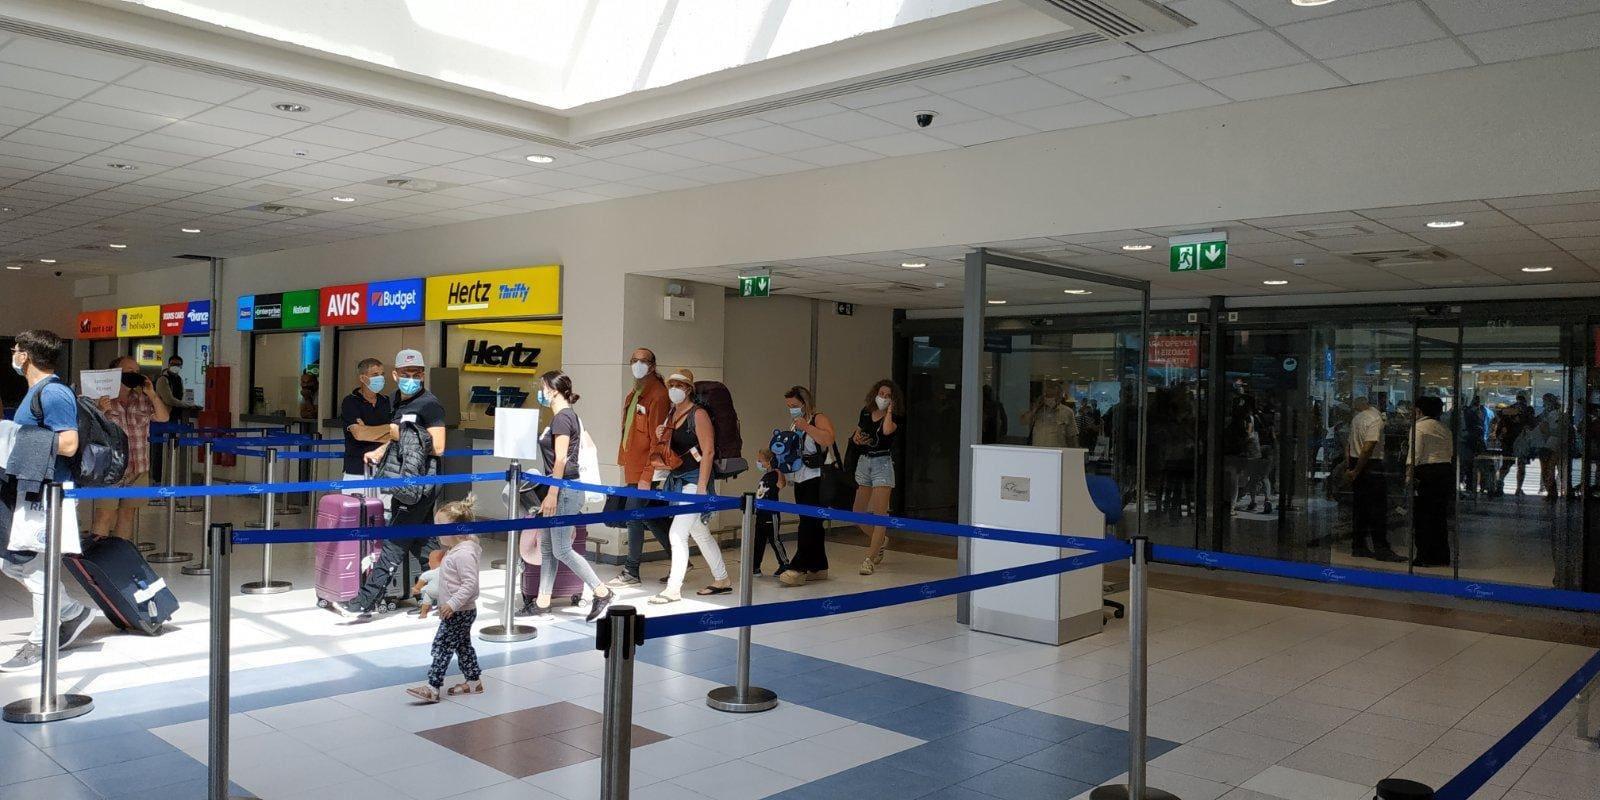 welcome to rhodes..Οι πρώτοι τουρίστες στο αεροδρόμιο Διαγόρας